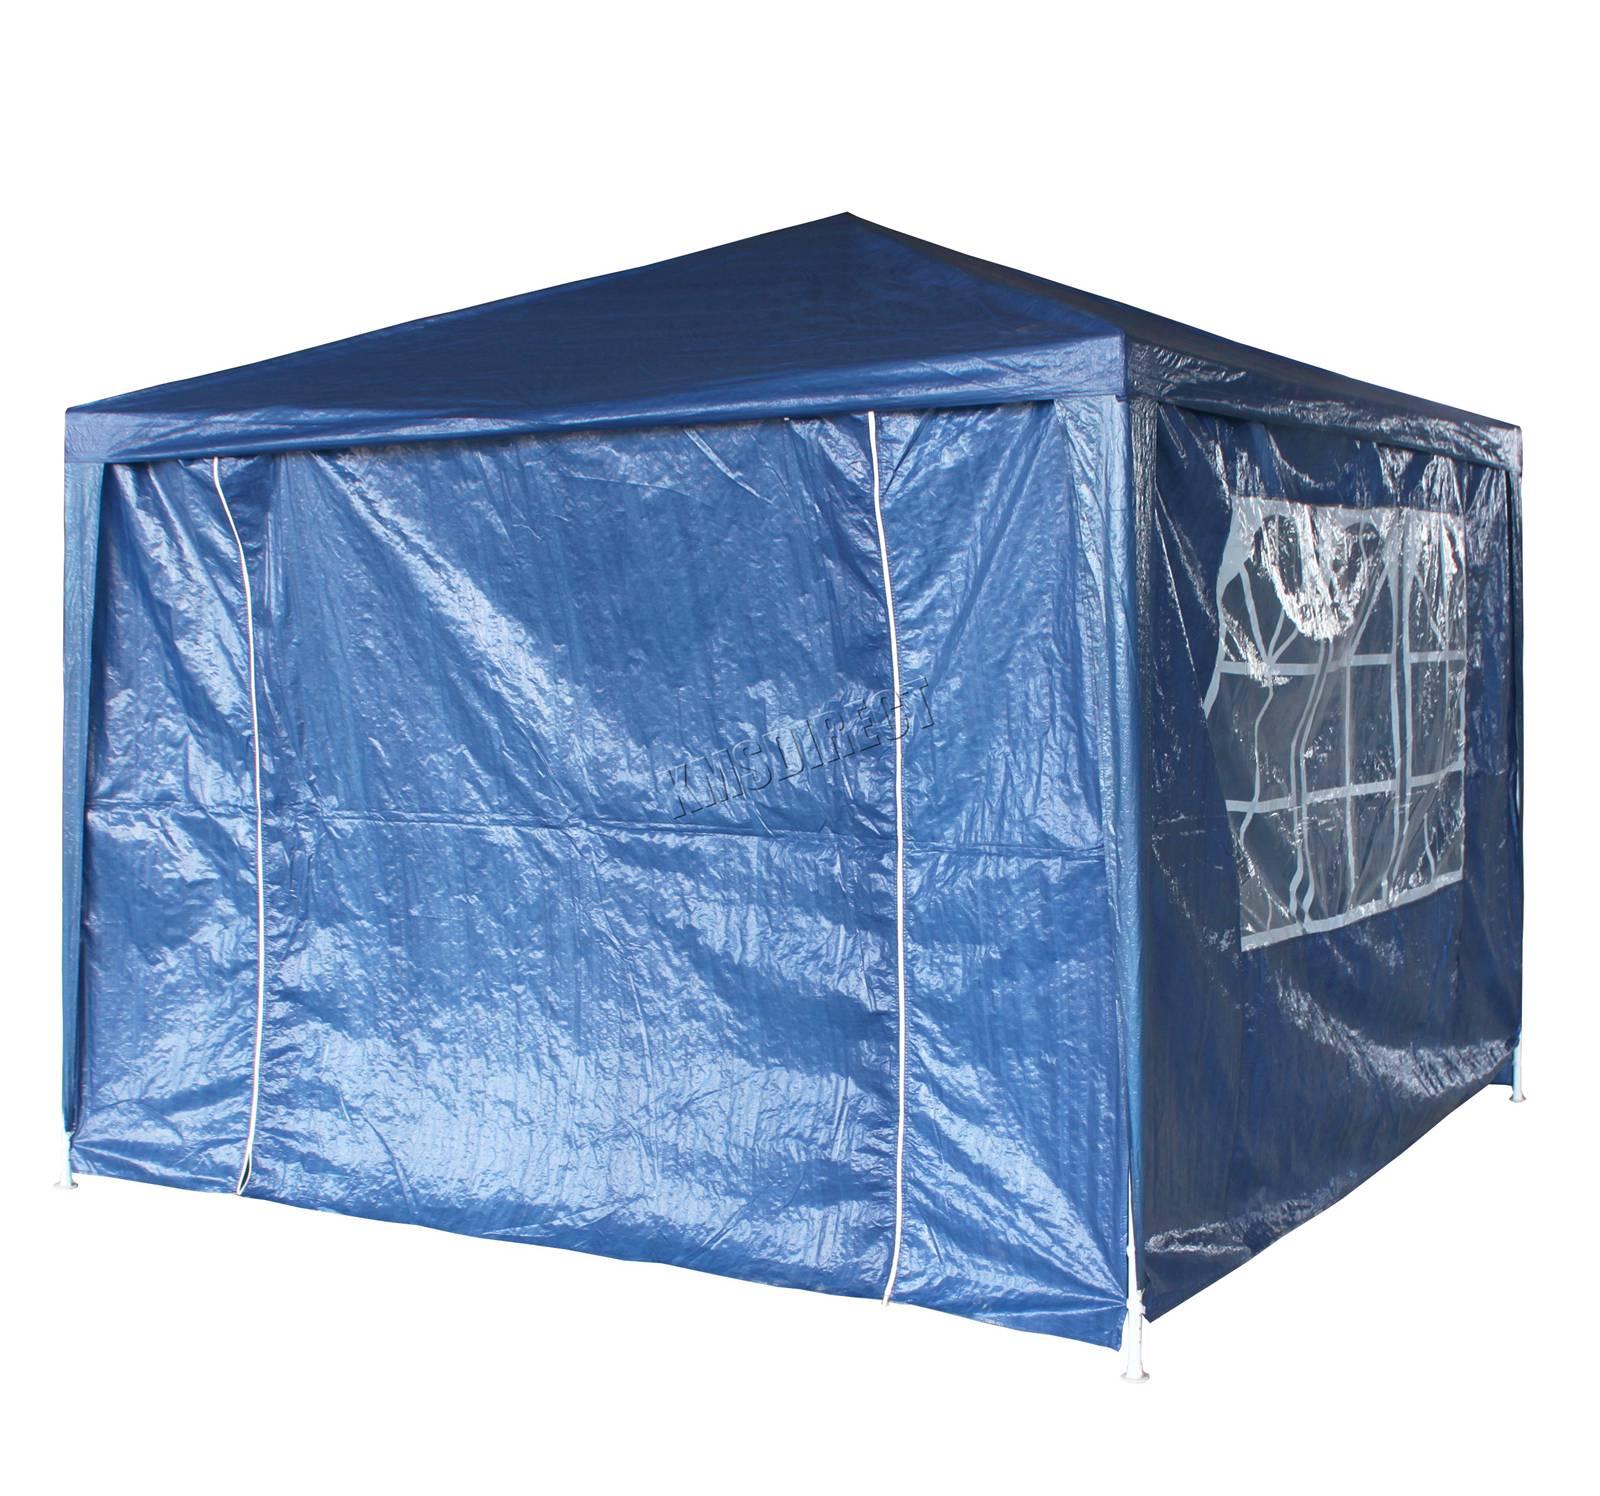 New-3-x-3m-120g-Waterproof-Outdoor-PE-Garden-Gazebo-Marquee-Canopy-Party-Tent Indexbild 17